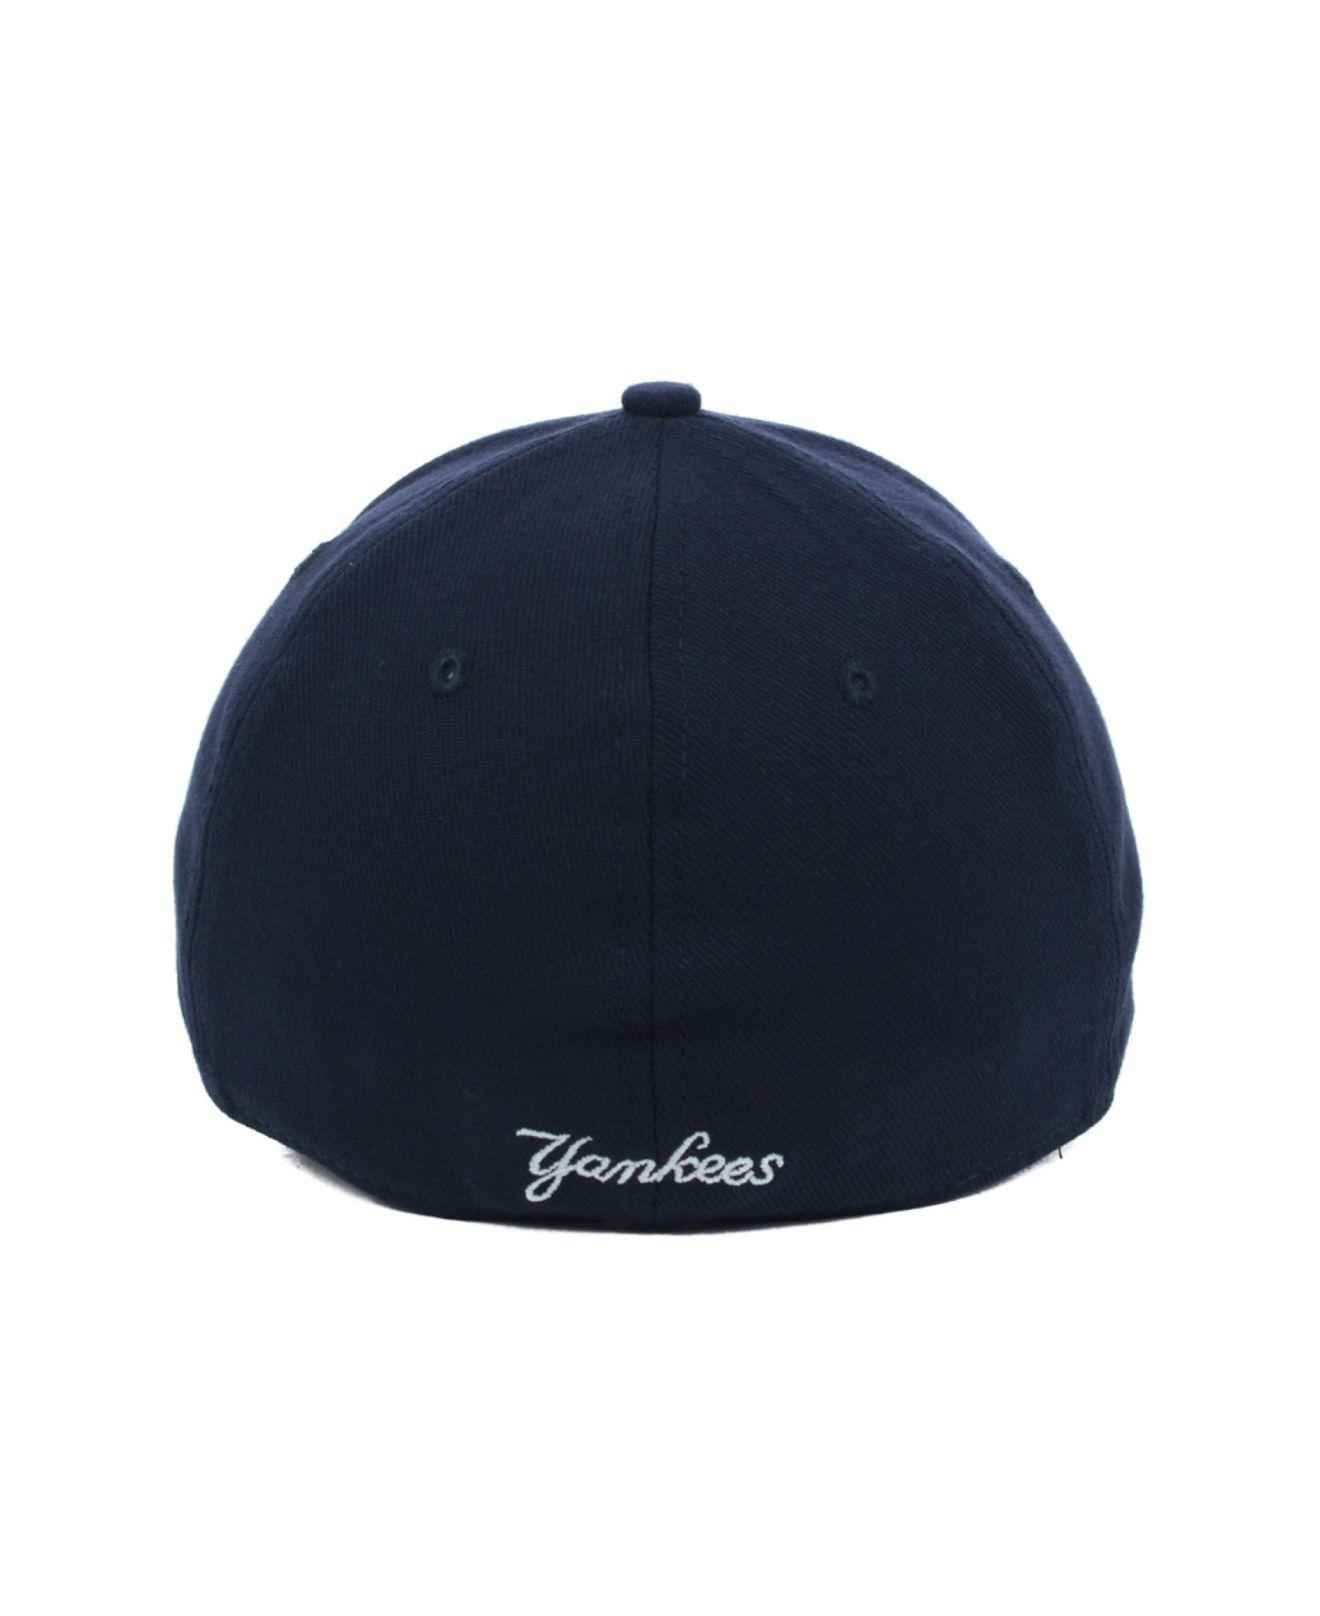 huge discount 1de4d 0c1bf ... coupon for new york yankees mlb team classic 39thirty cap for men lyst.  view fullscreen